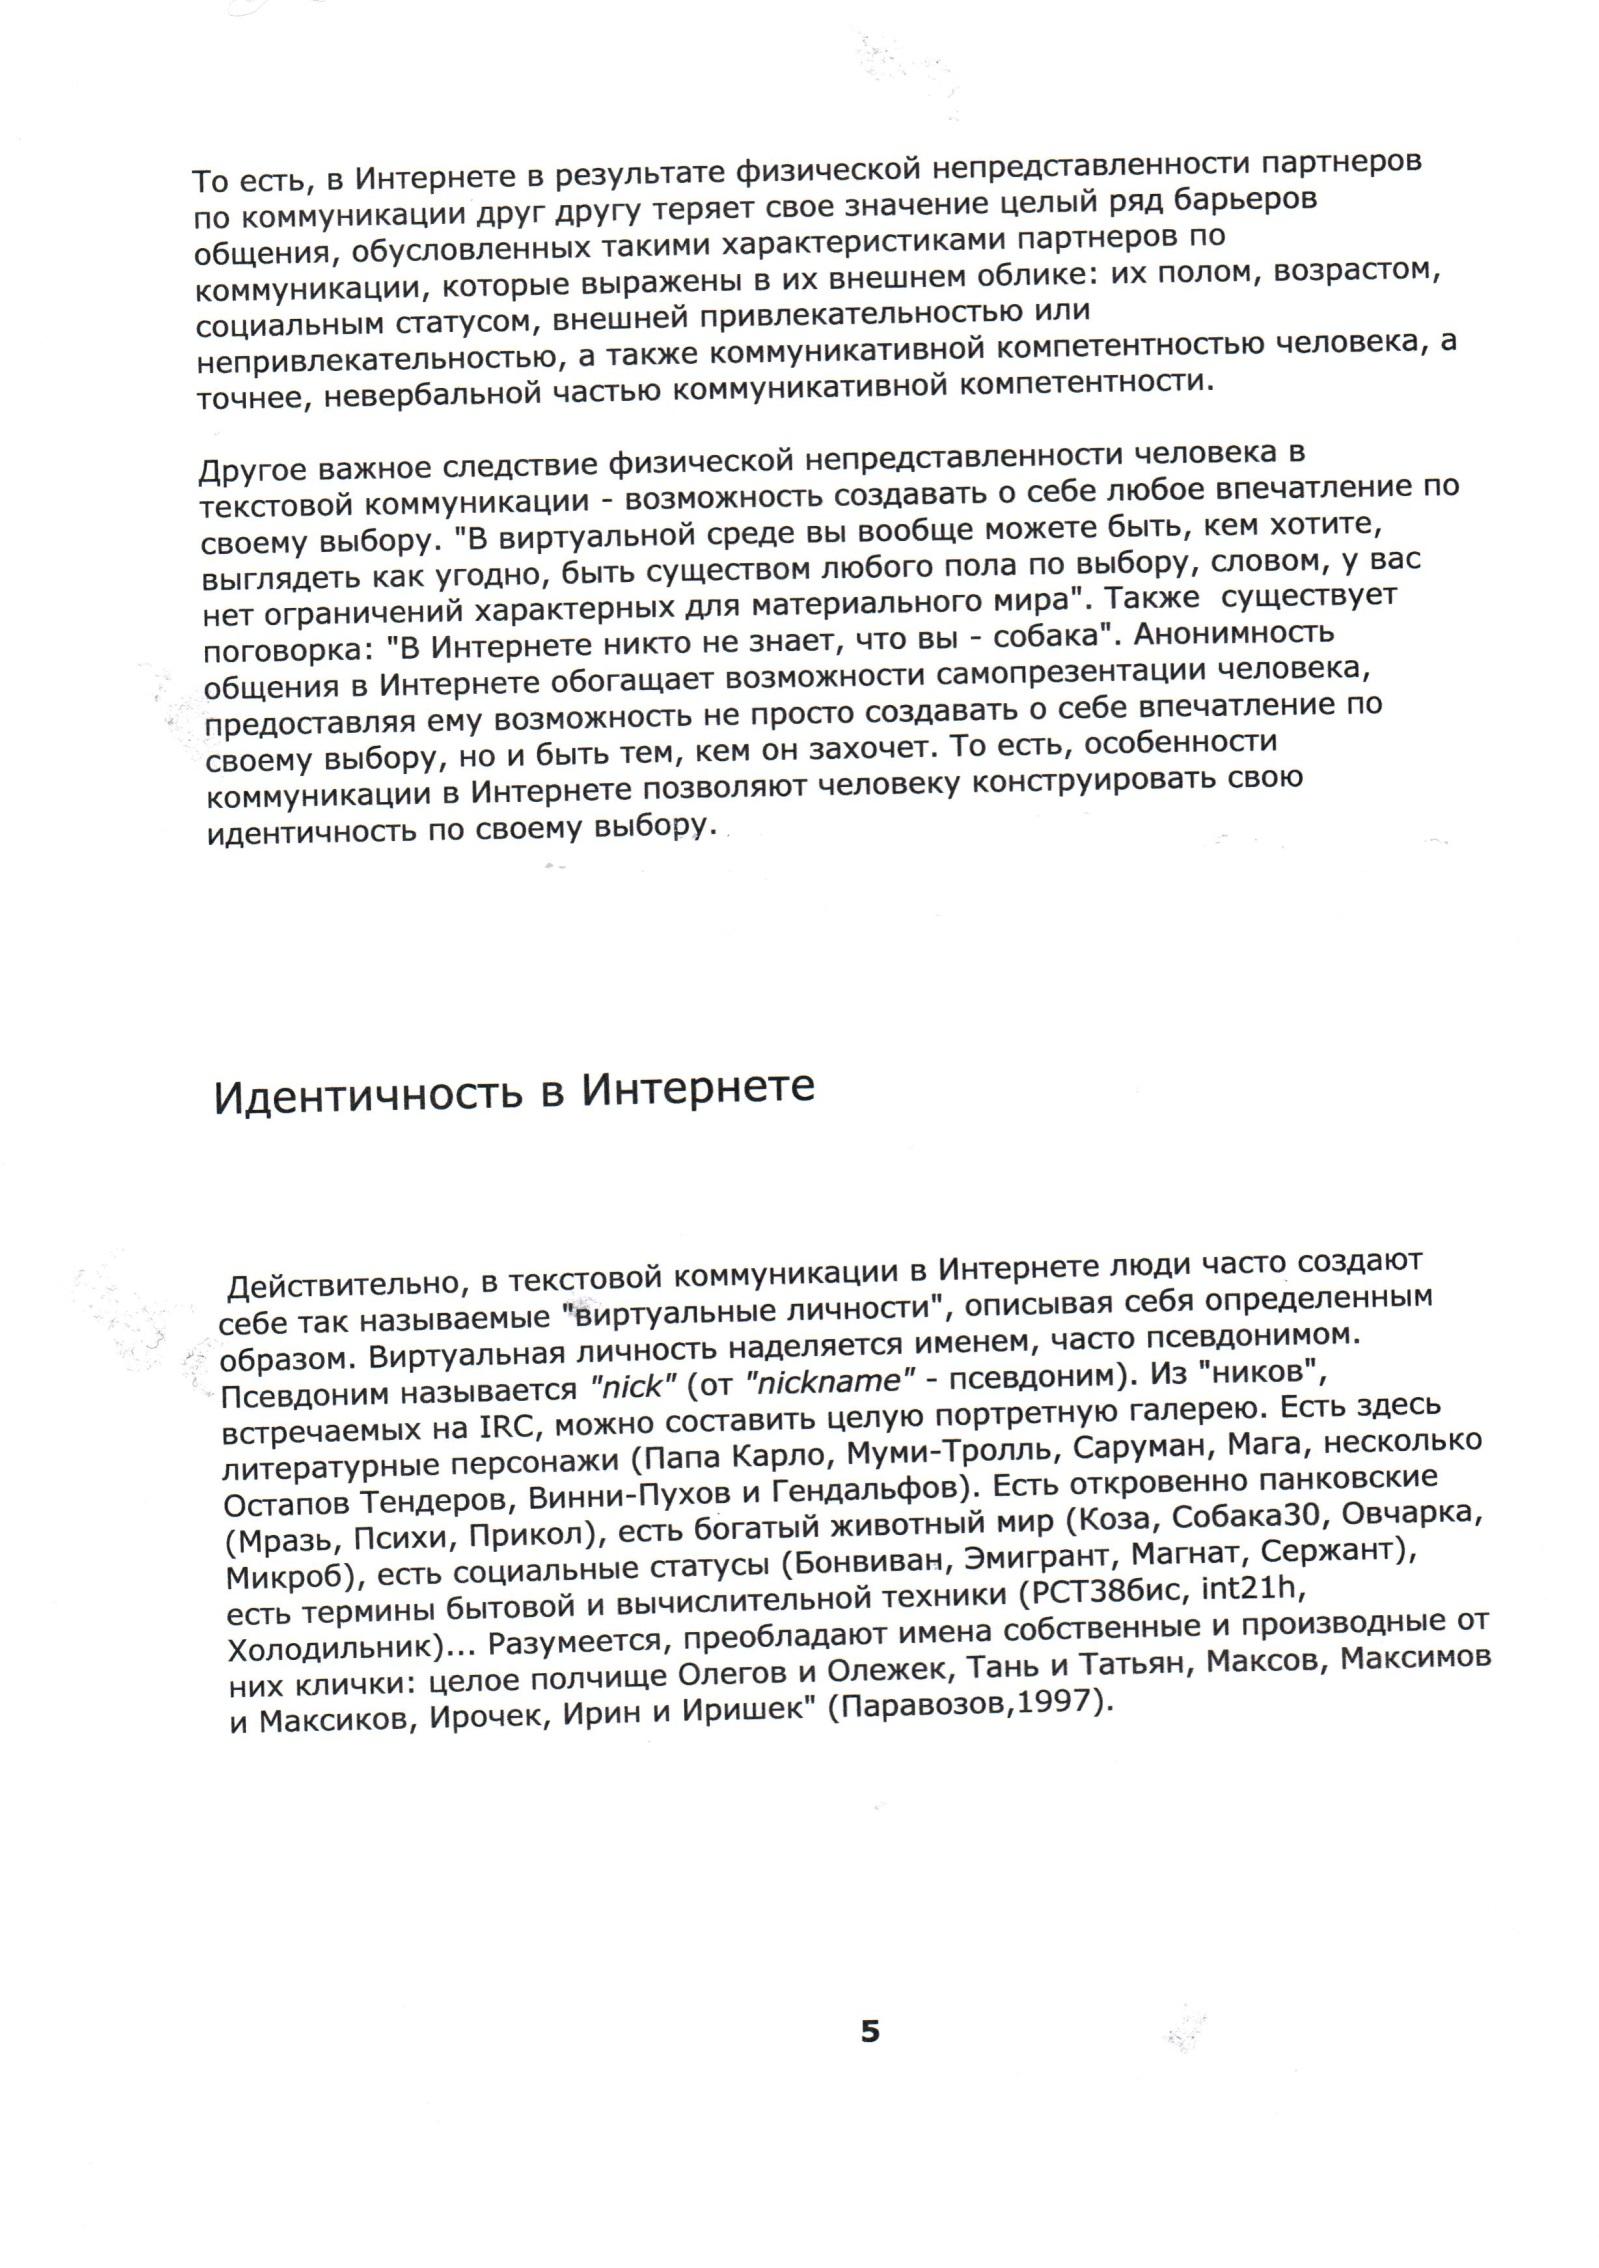 C:\Users\Ирина\Documents\Panasonic\MFS\Scan\20160225_104031.jpg